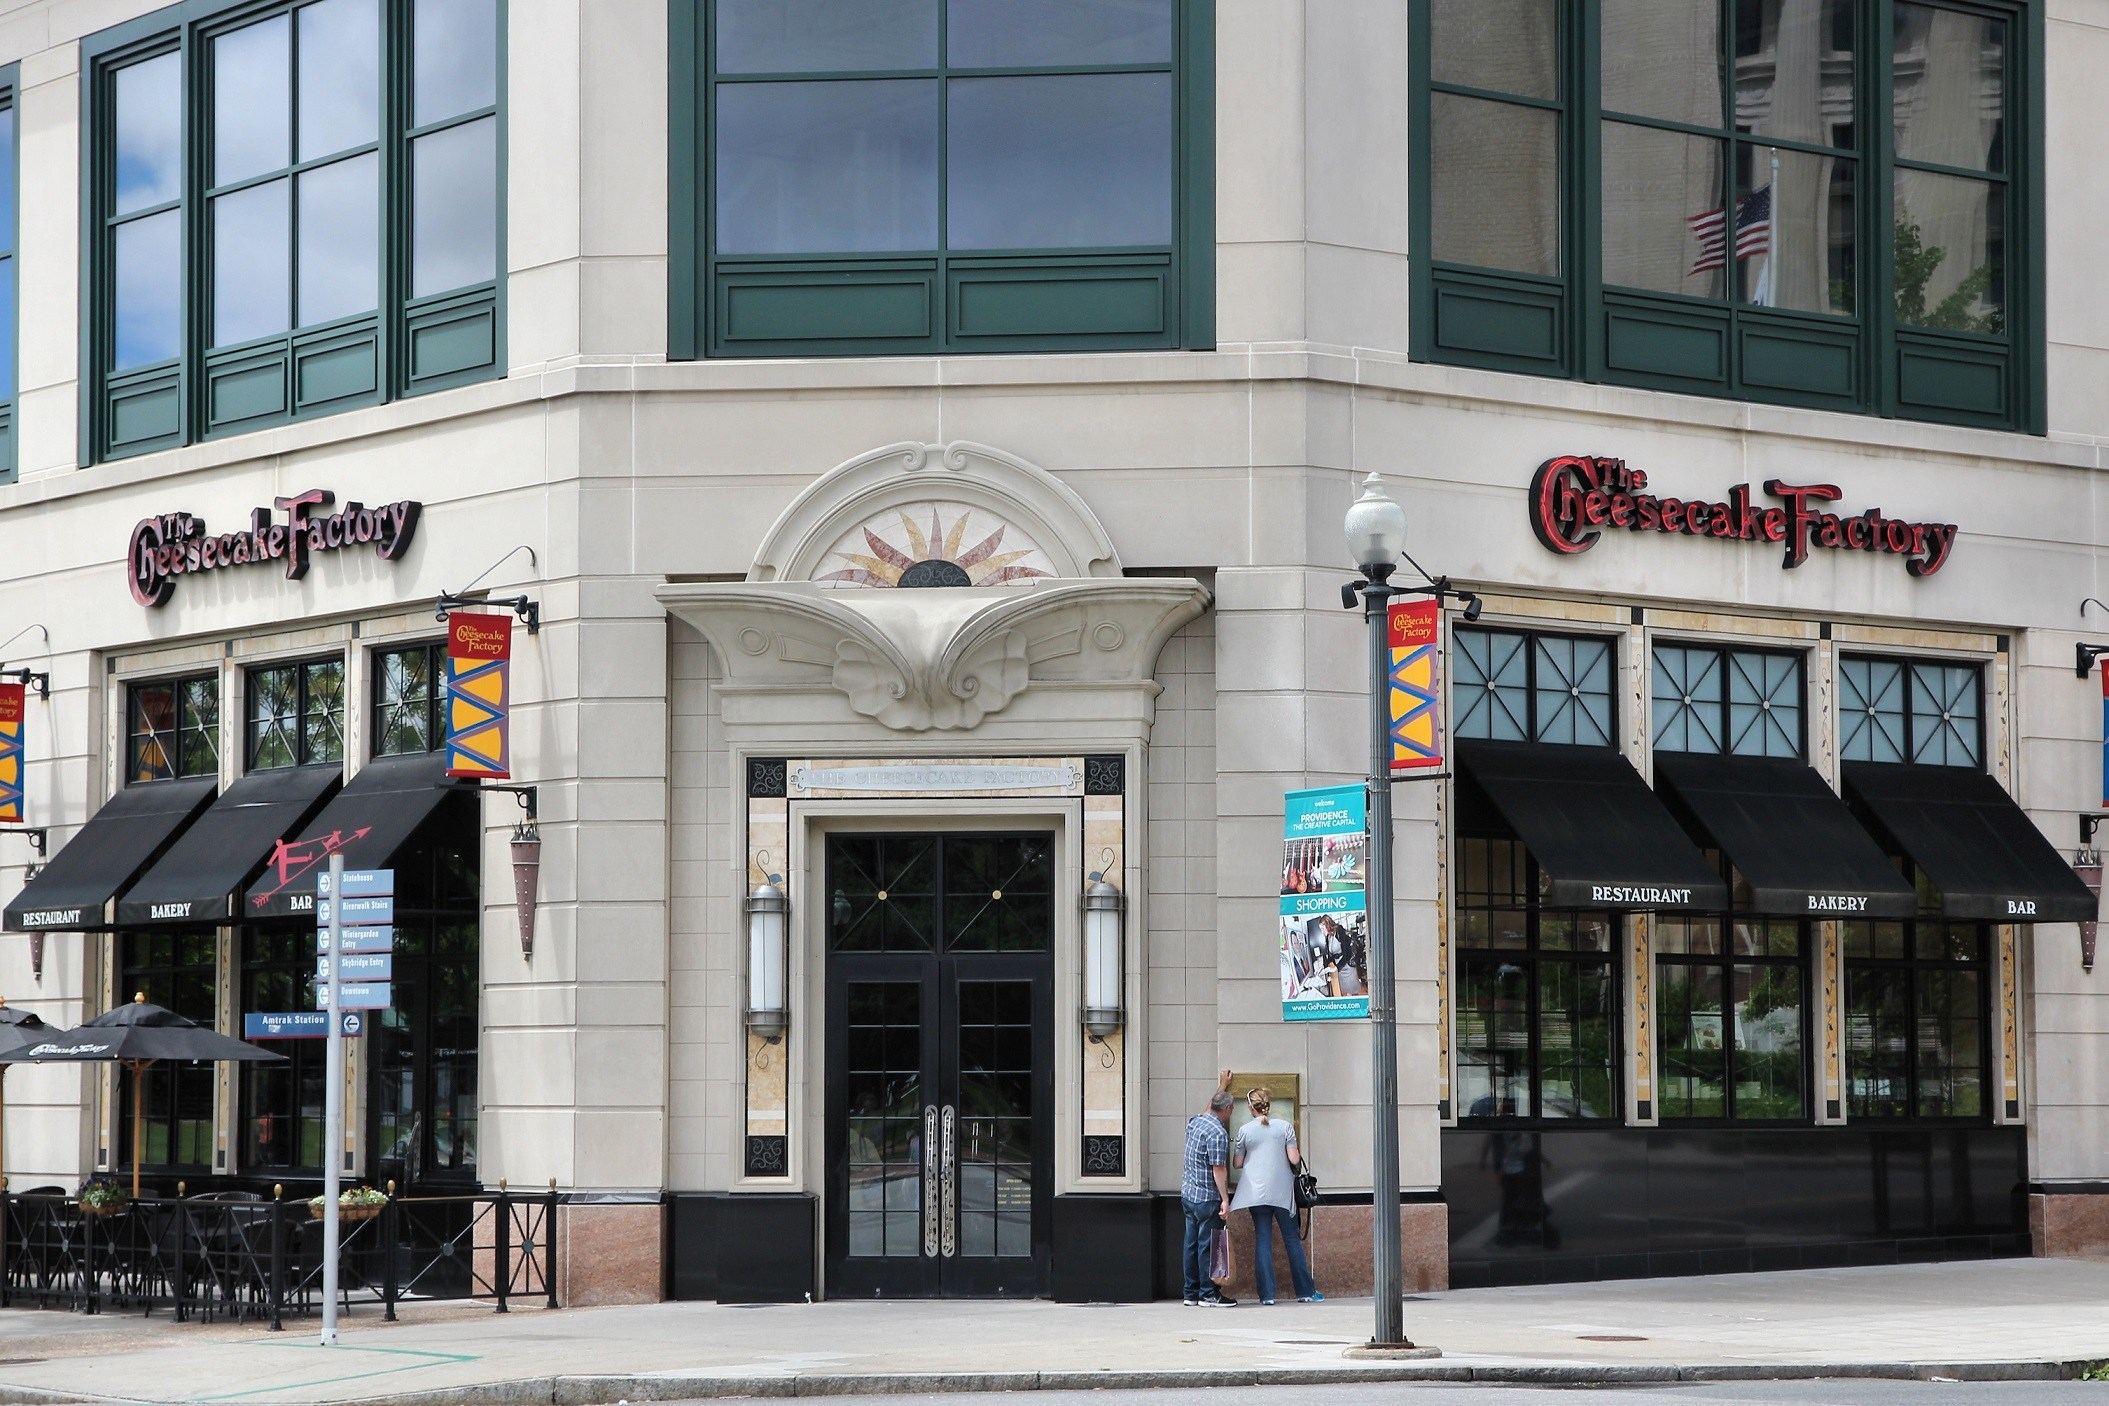 Cheesecake Factory restaurant exterior